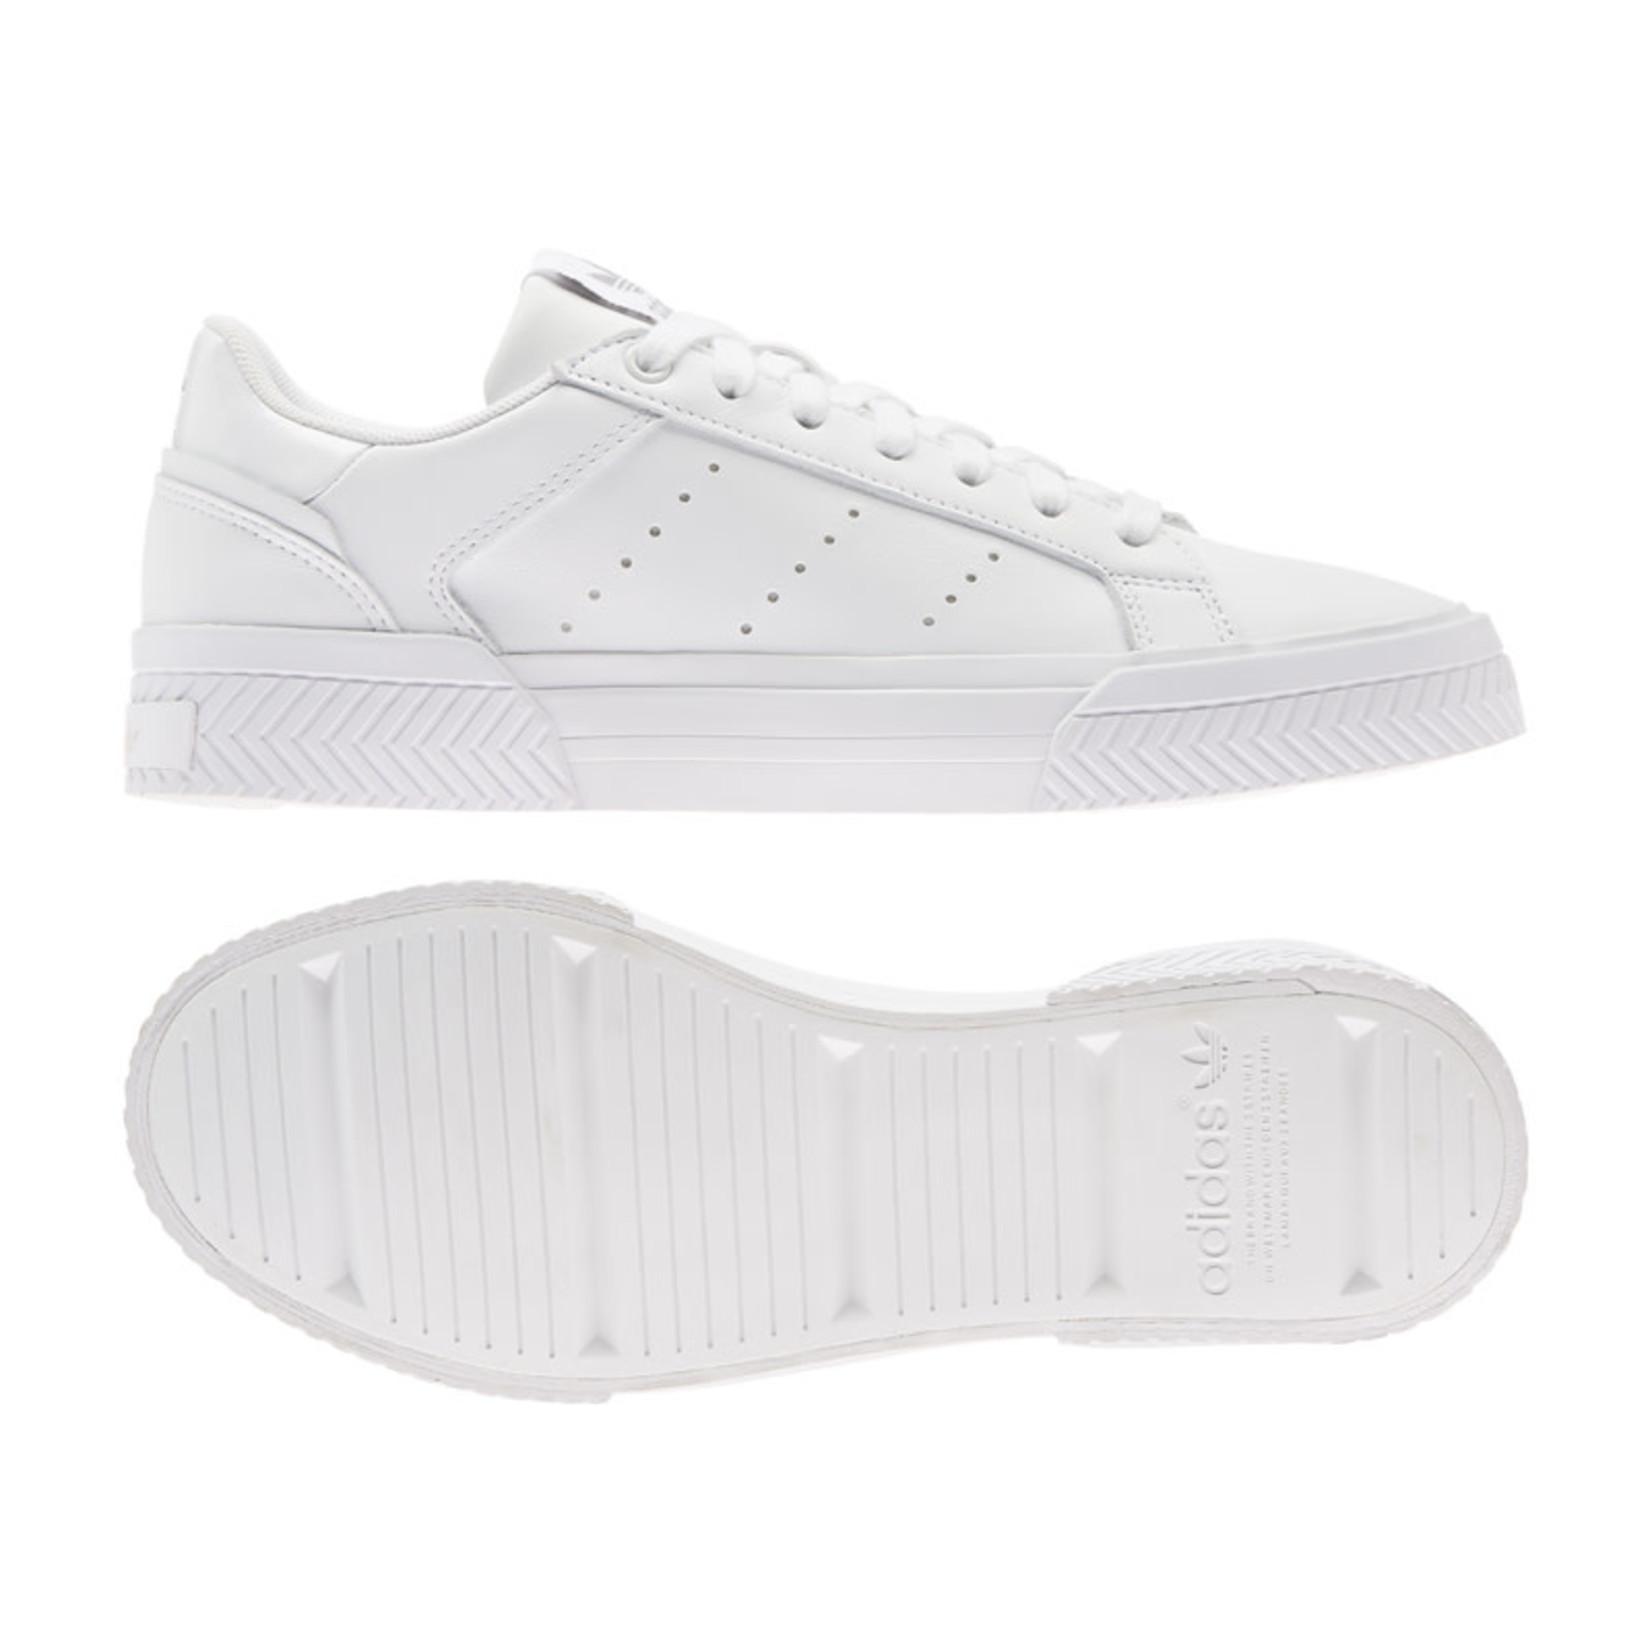 Adidas Adidas : Court Torino Women Shoes